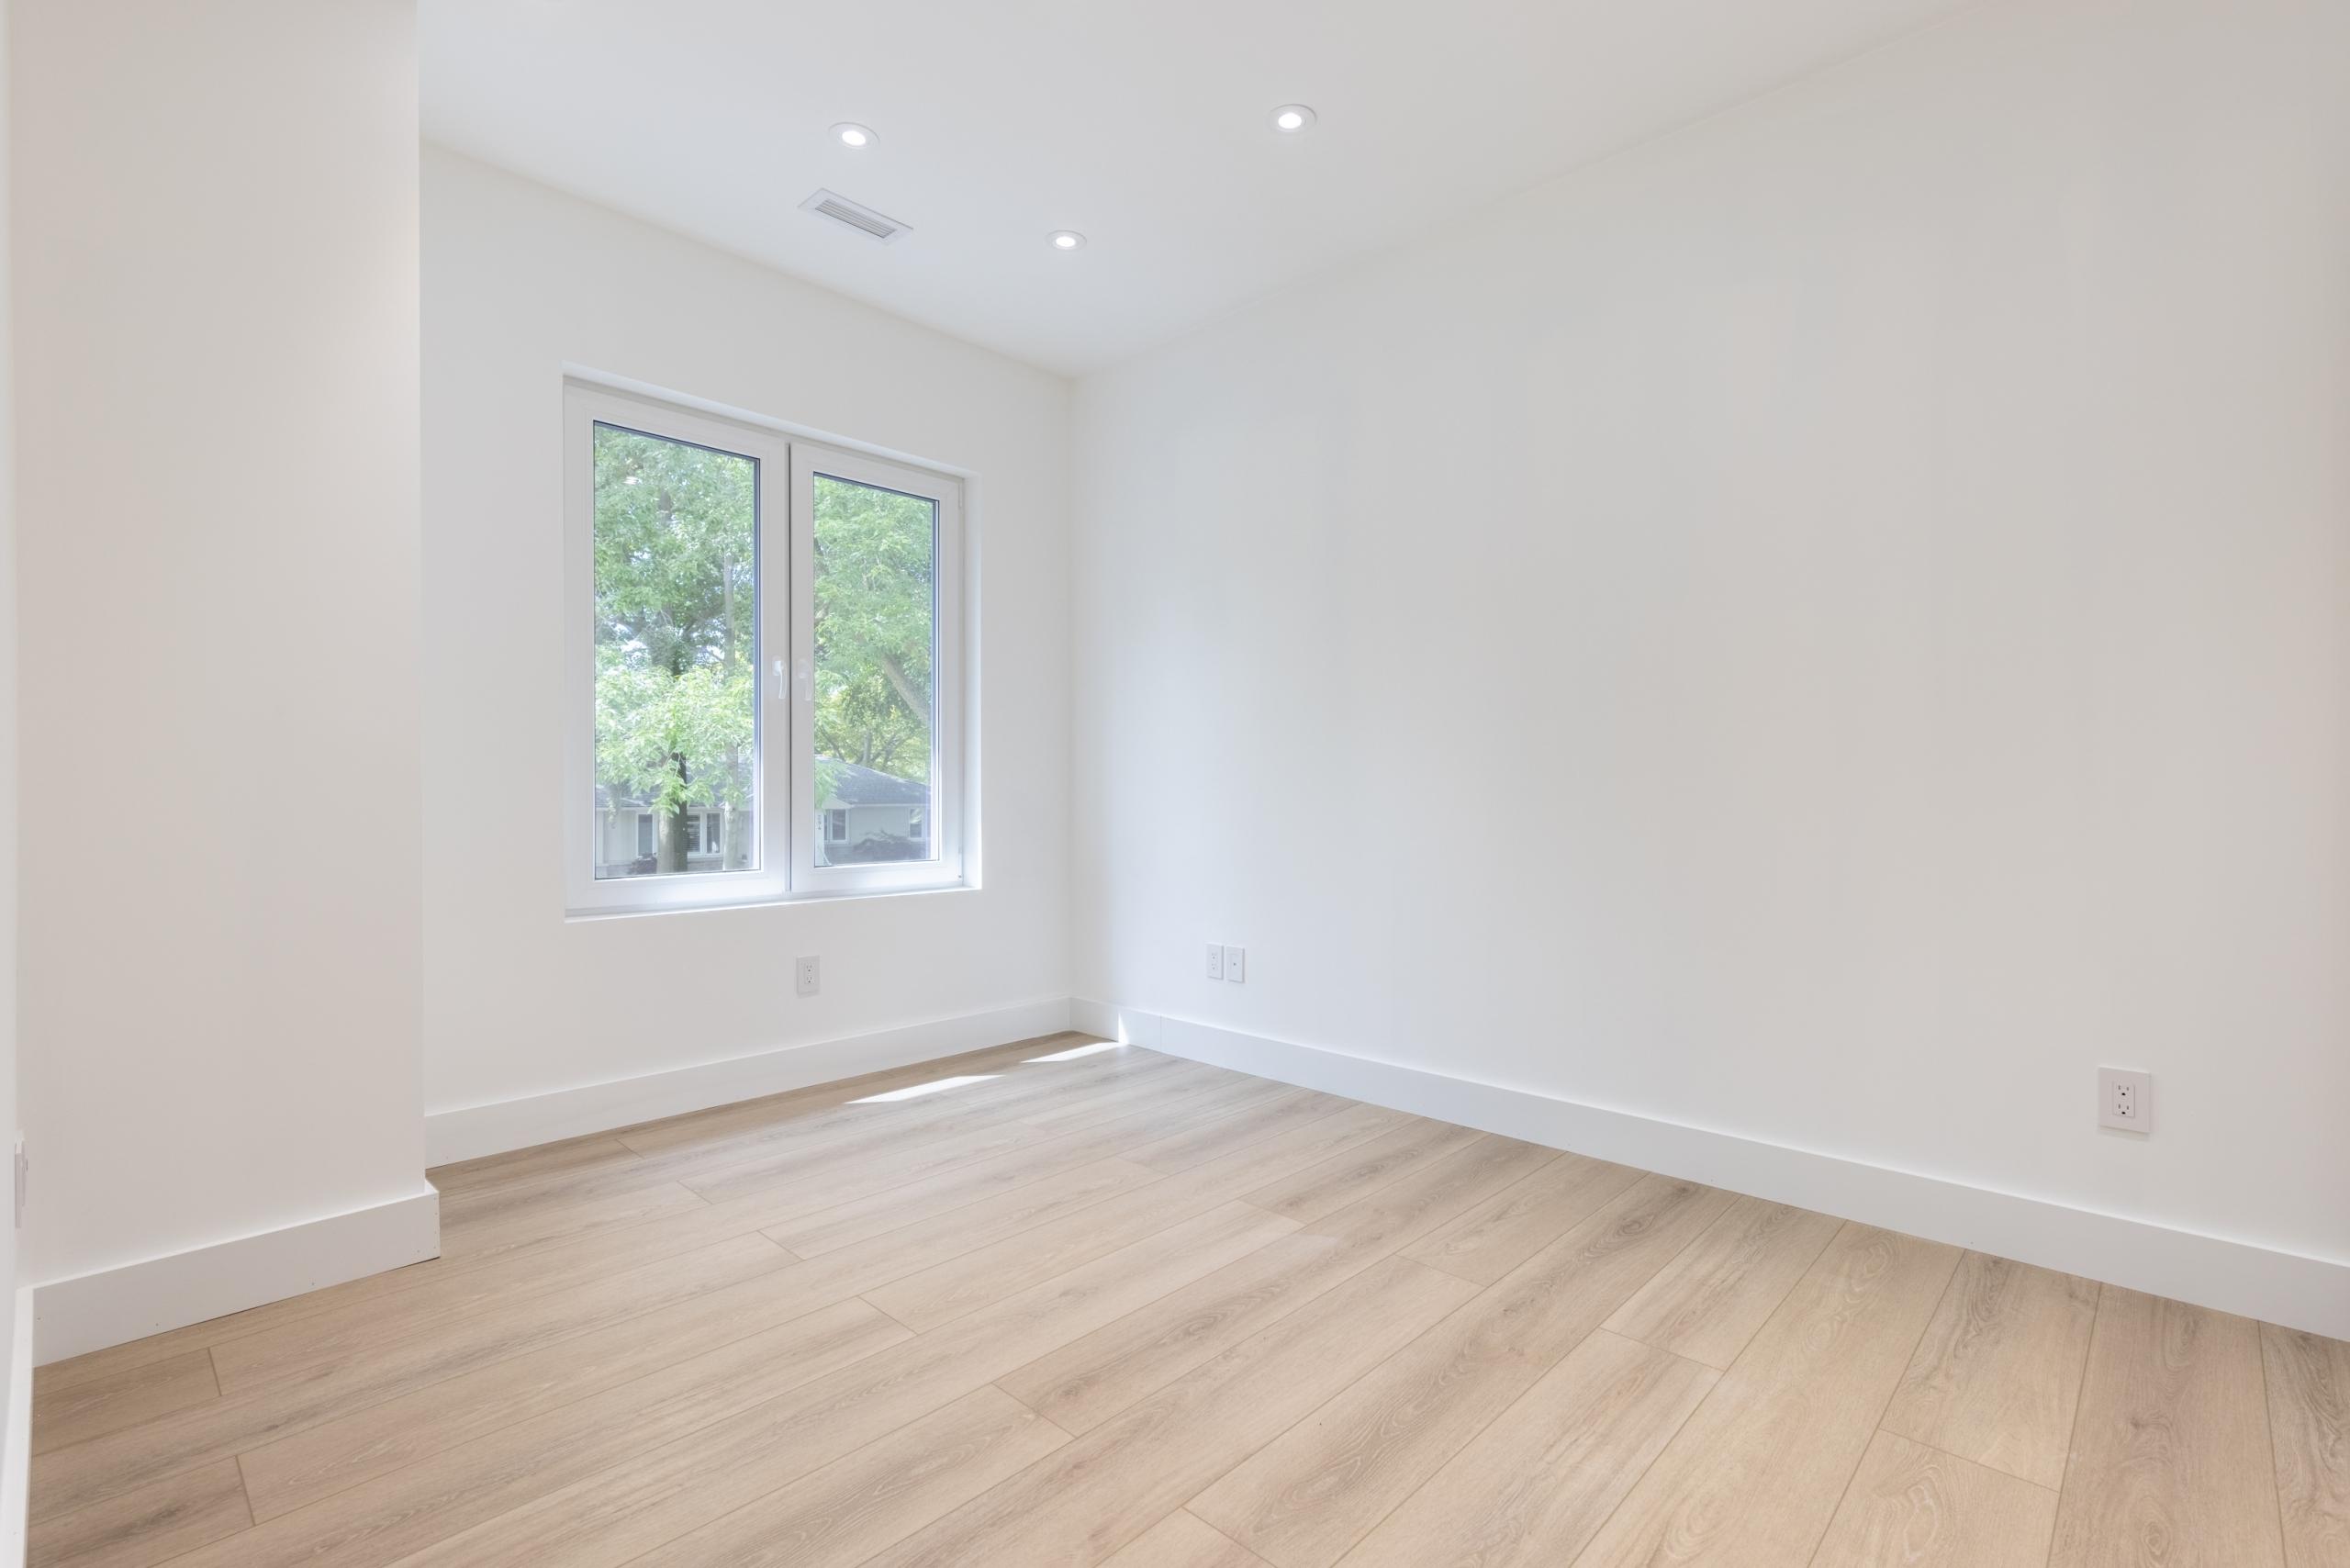 Bedroom featured at 287 Sabel Street, Oakville, ON at Alex Irish & Associates